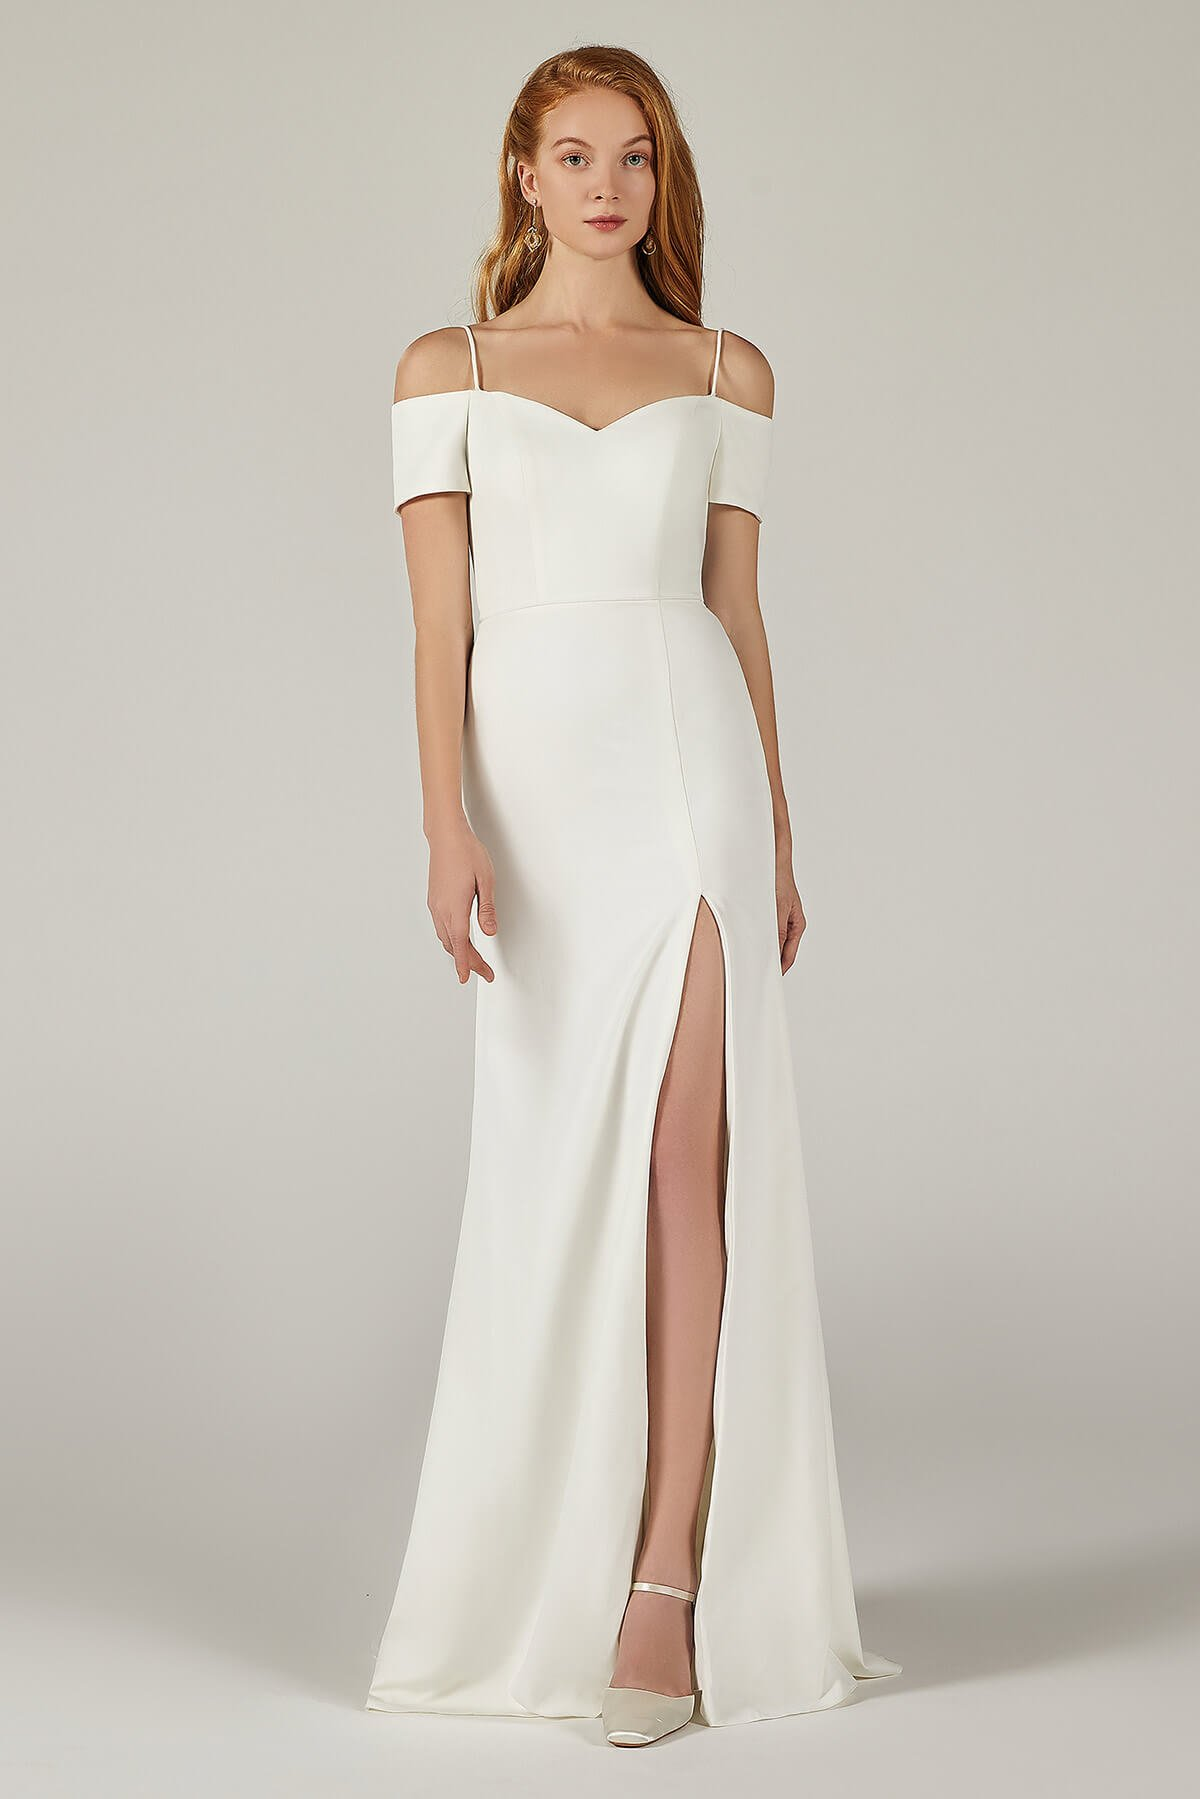 Cocomelody Black Wedding Dress List - CW2215